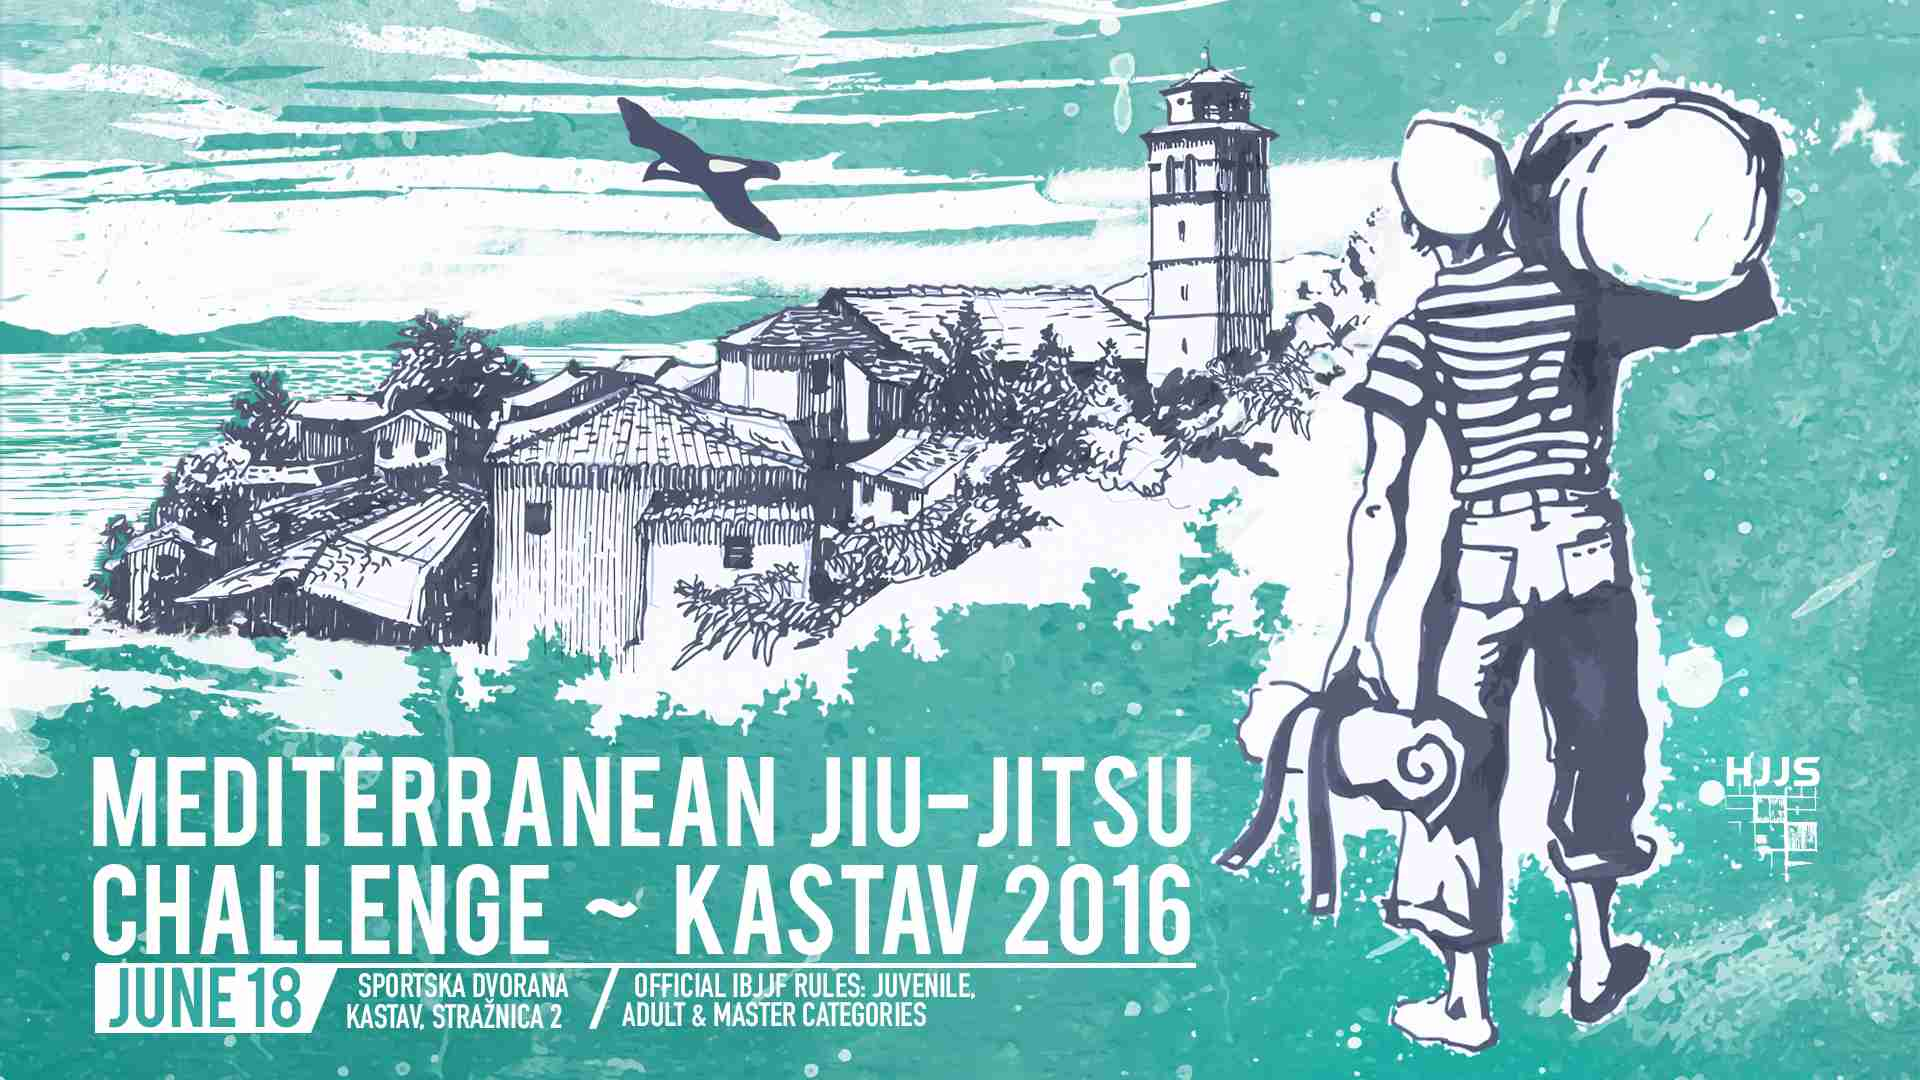 Mediterranean Jiu-Jitsu Challenge – Kastav 2016